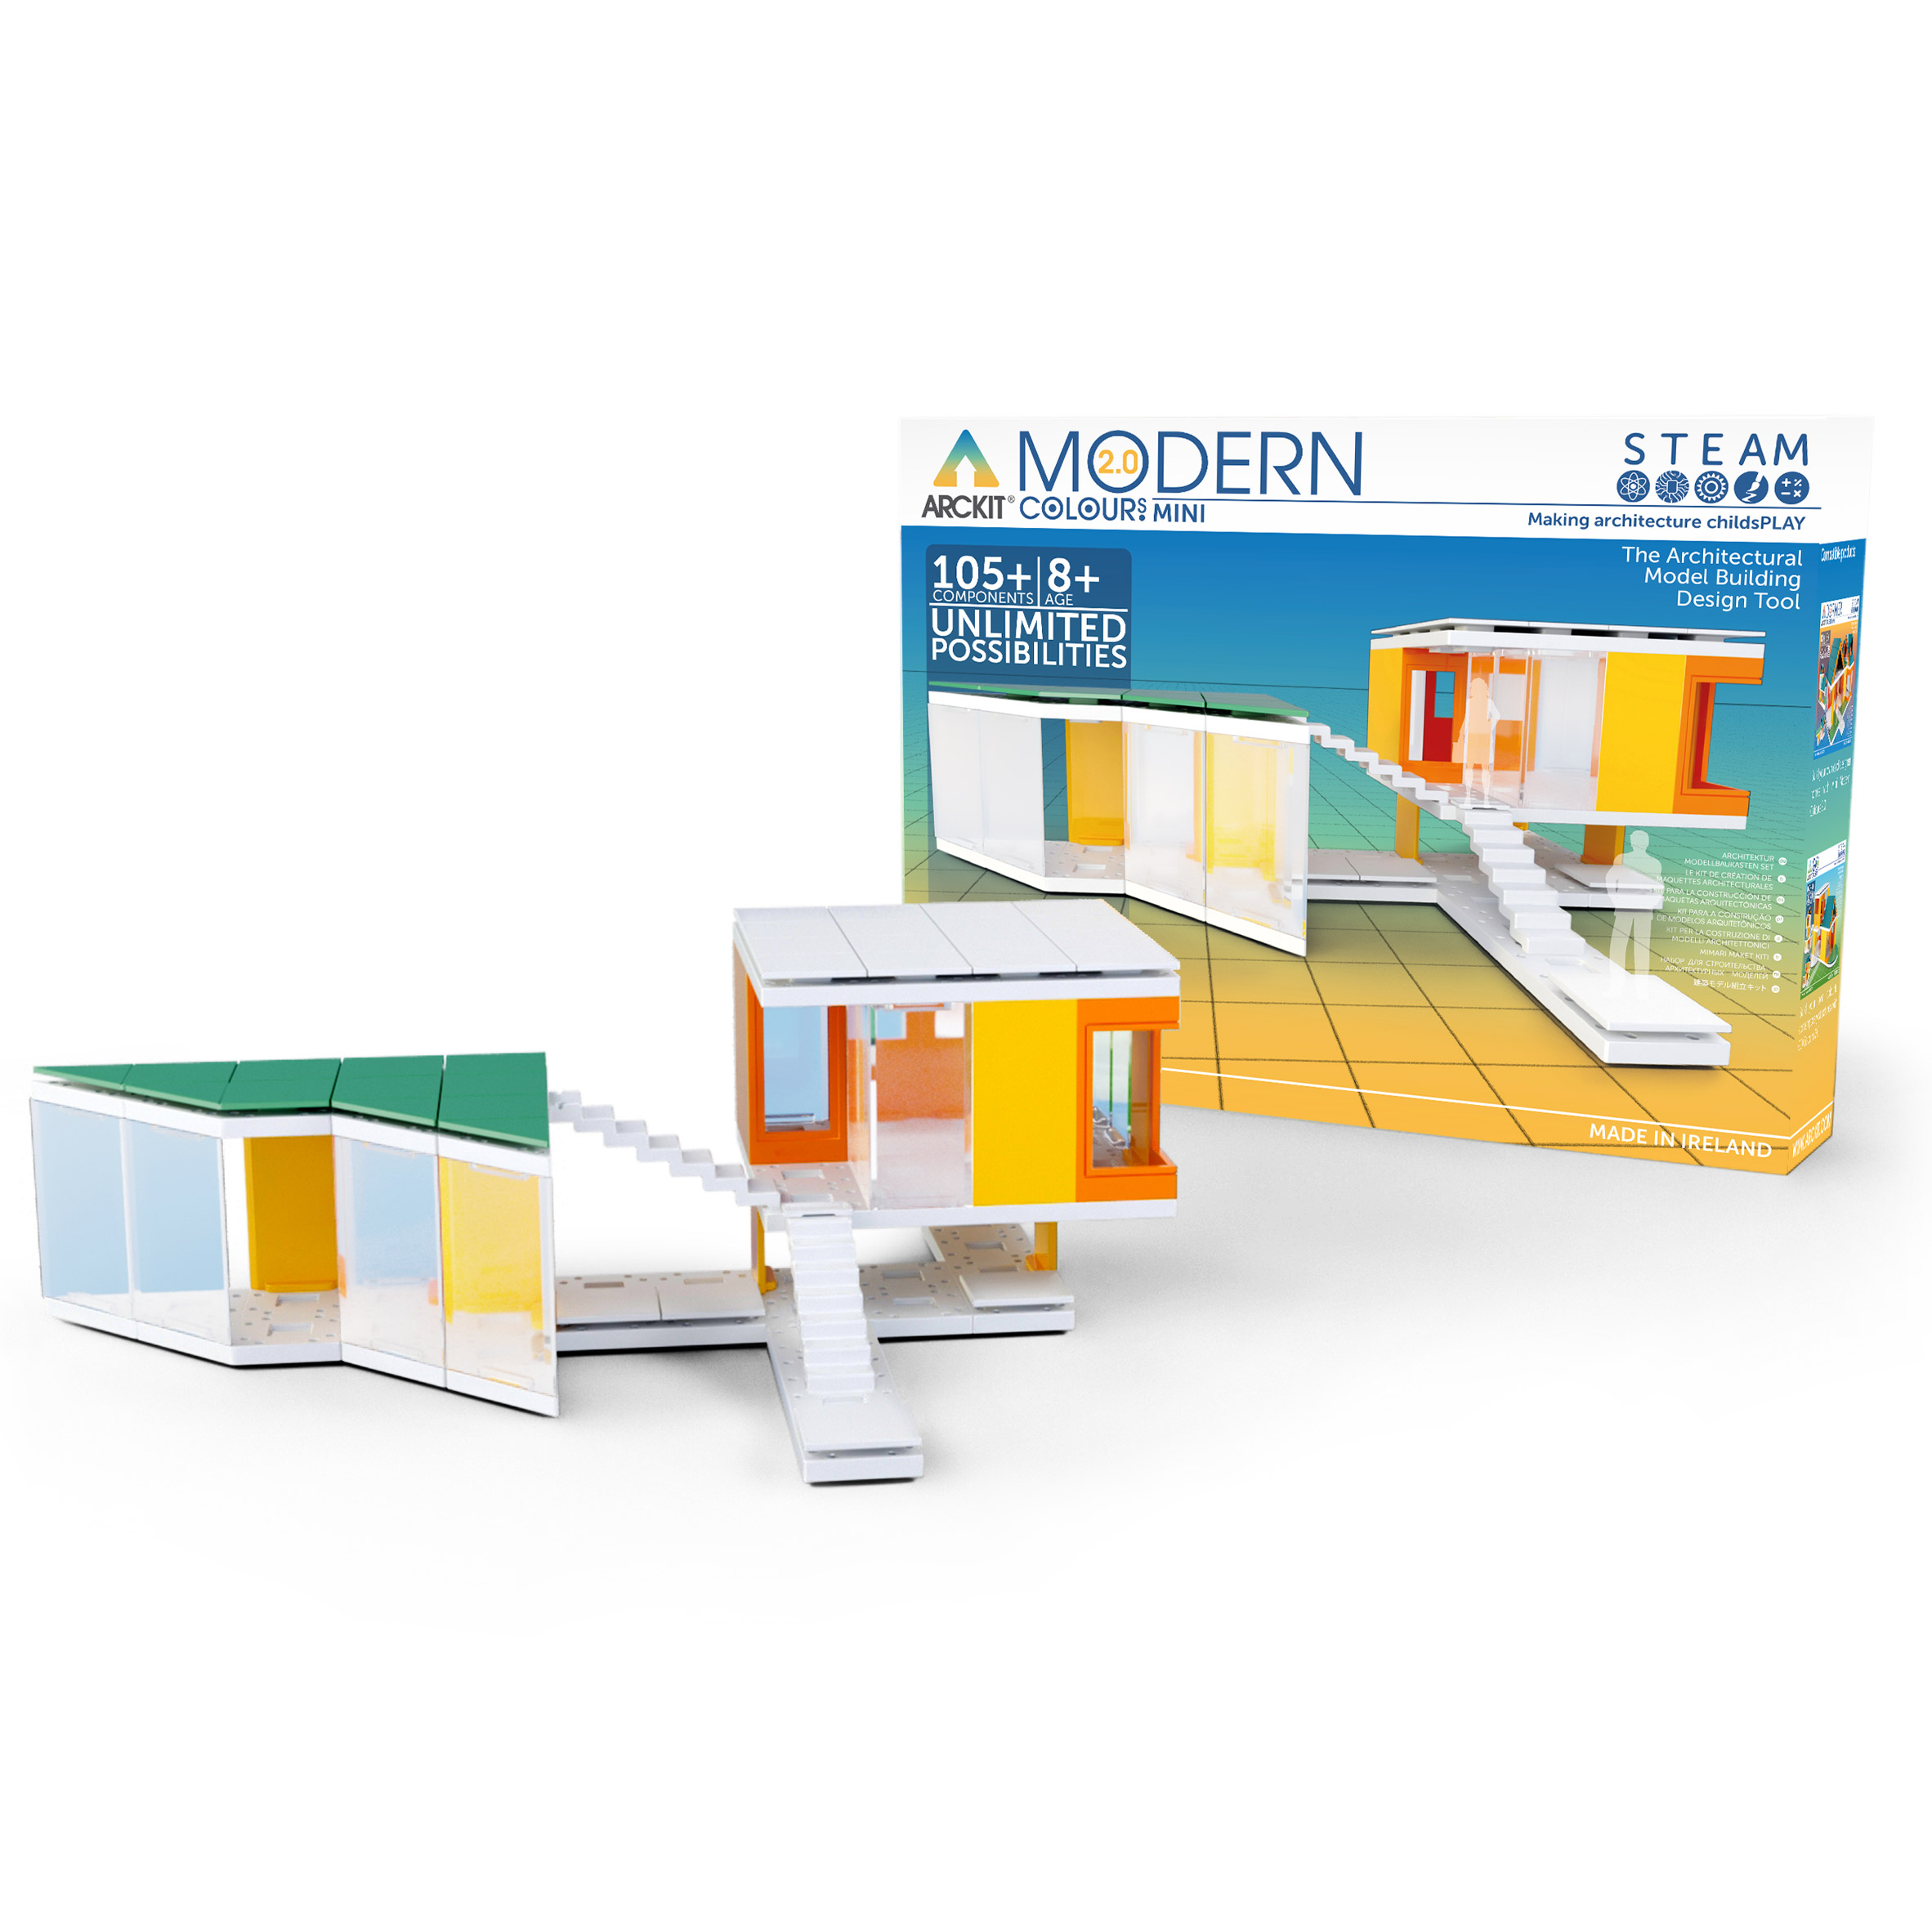 Mini Modern Colours 2.0 by ArcKit